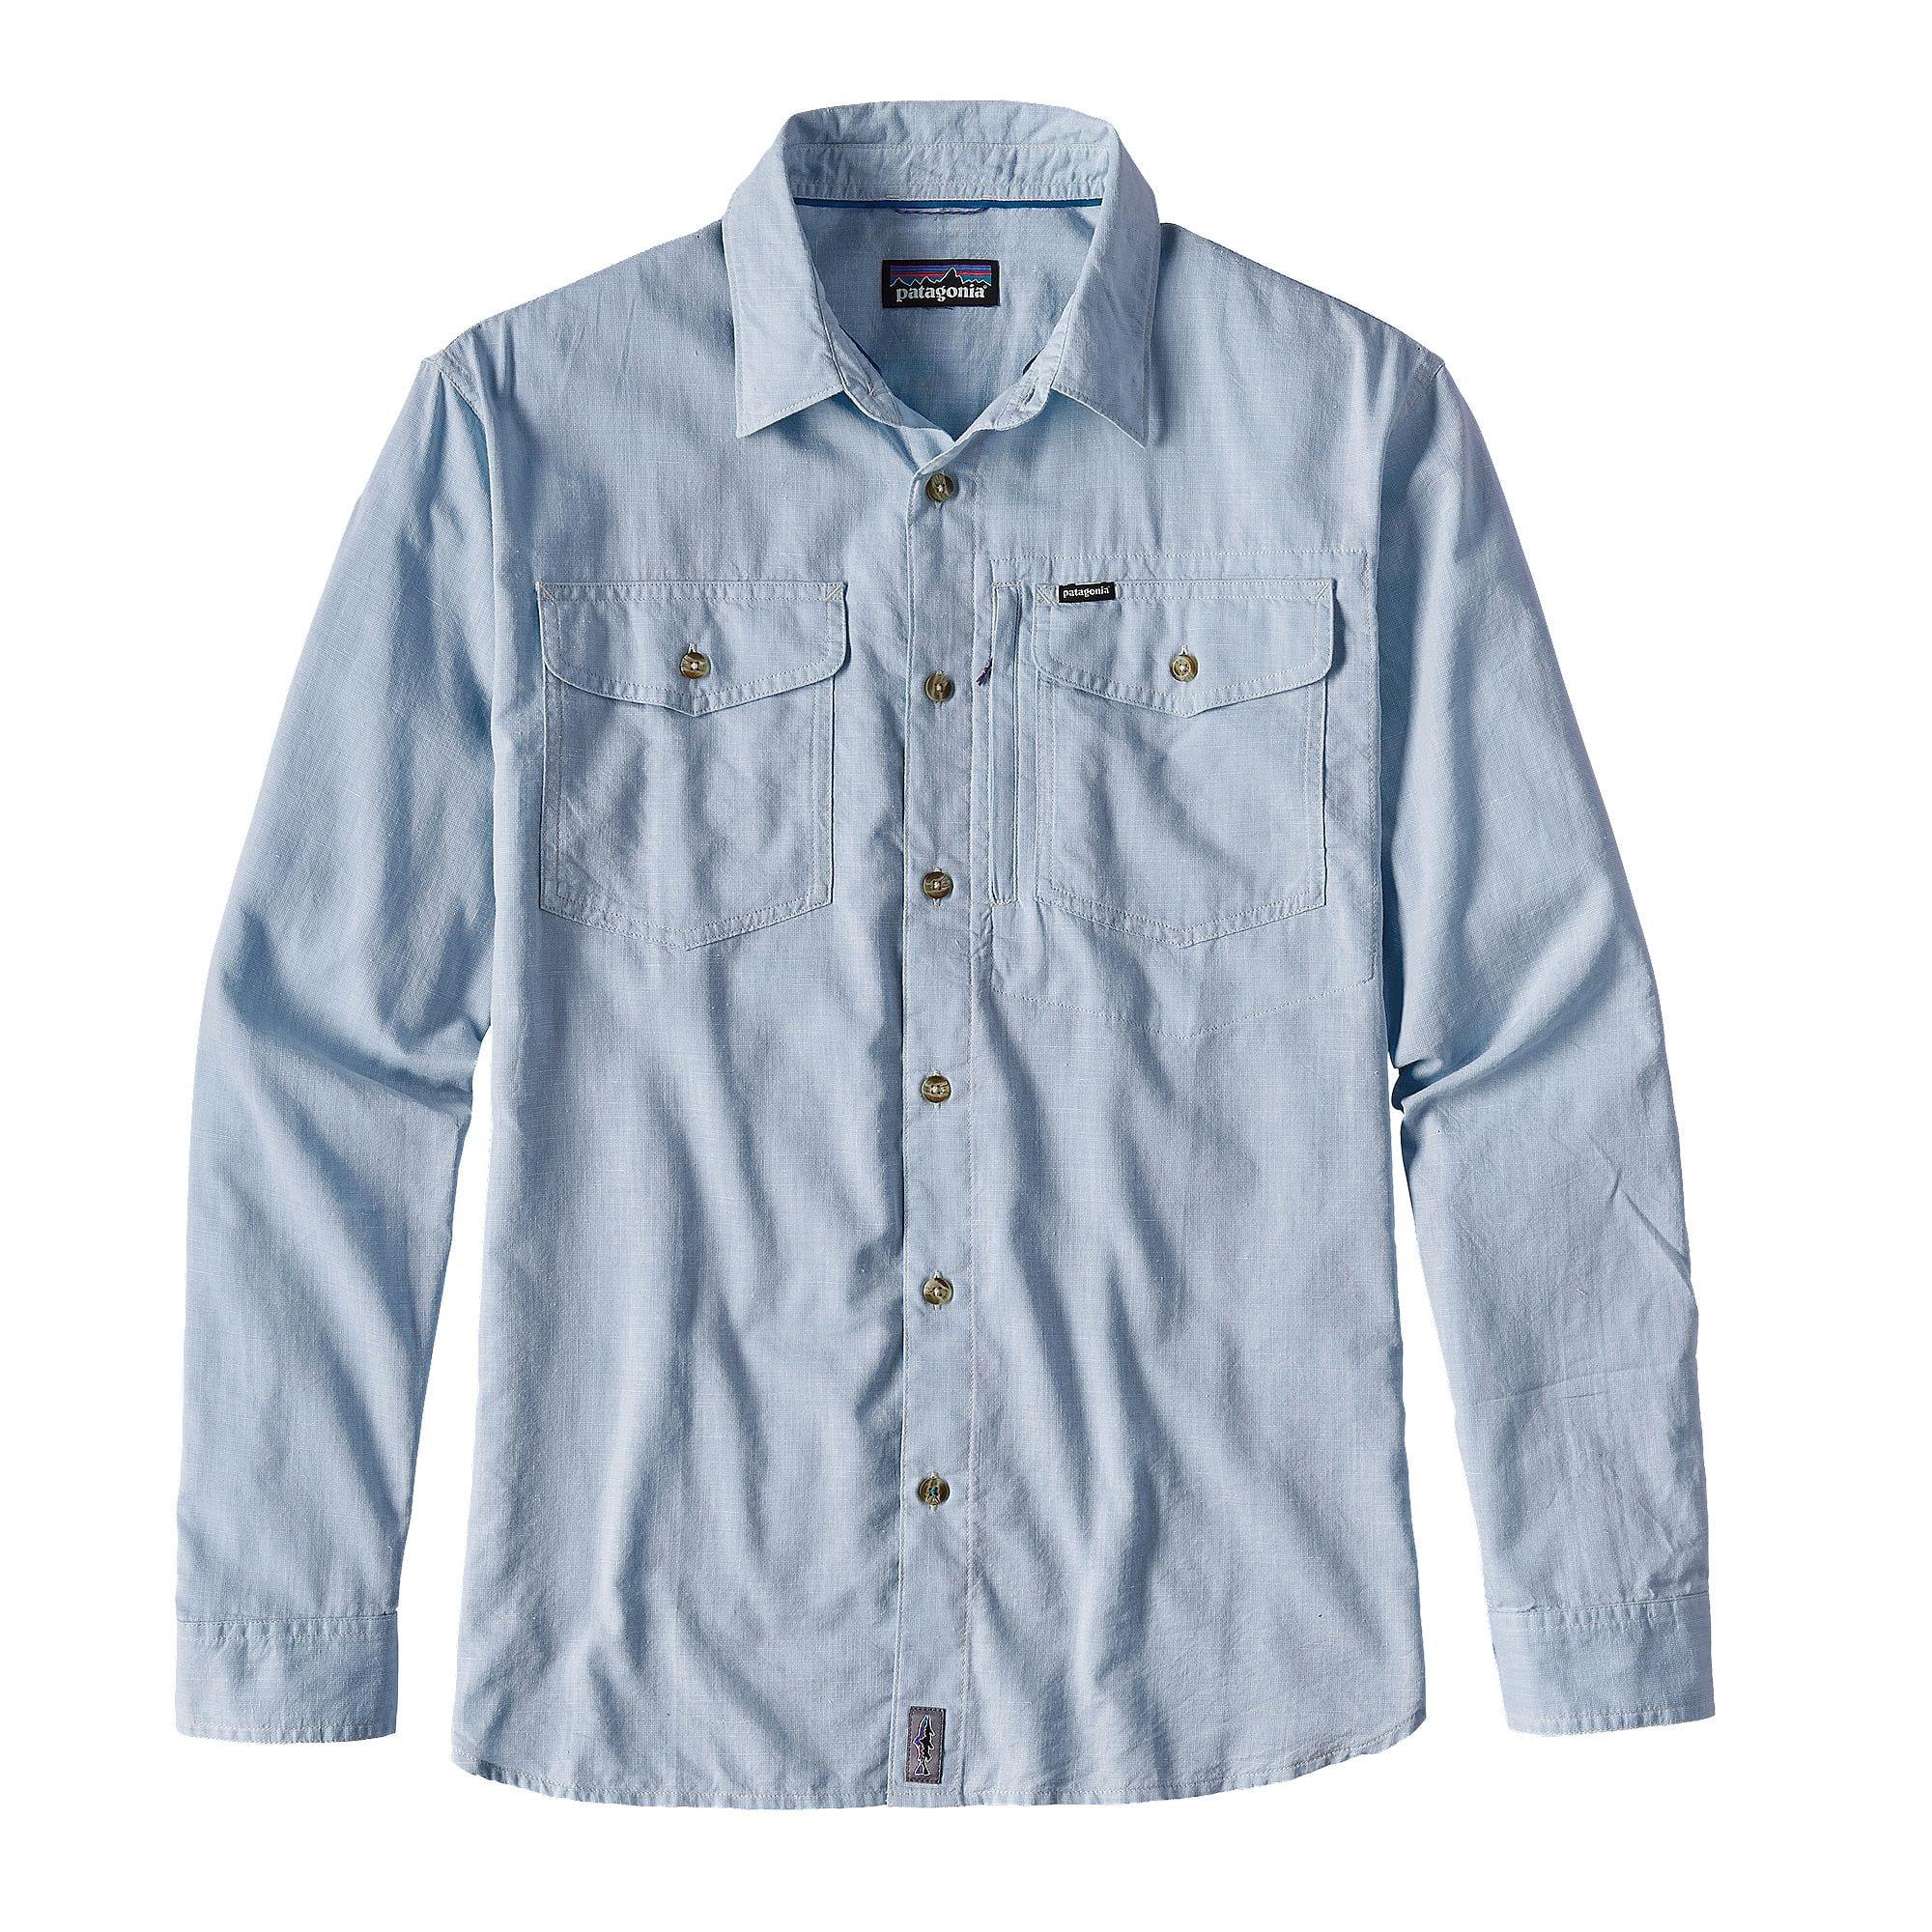 Patagonia mens cayo largo shirt the sporting lodge for Patagonia fishing shirt